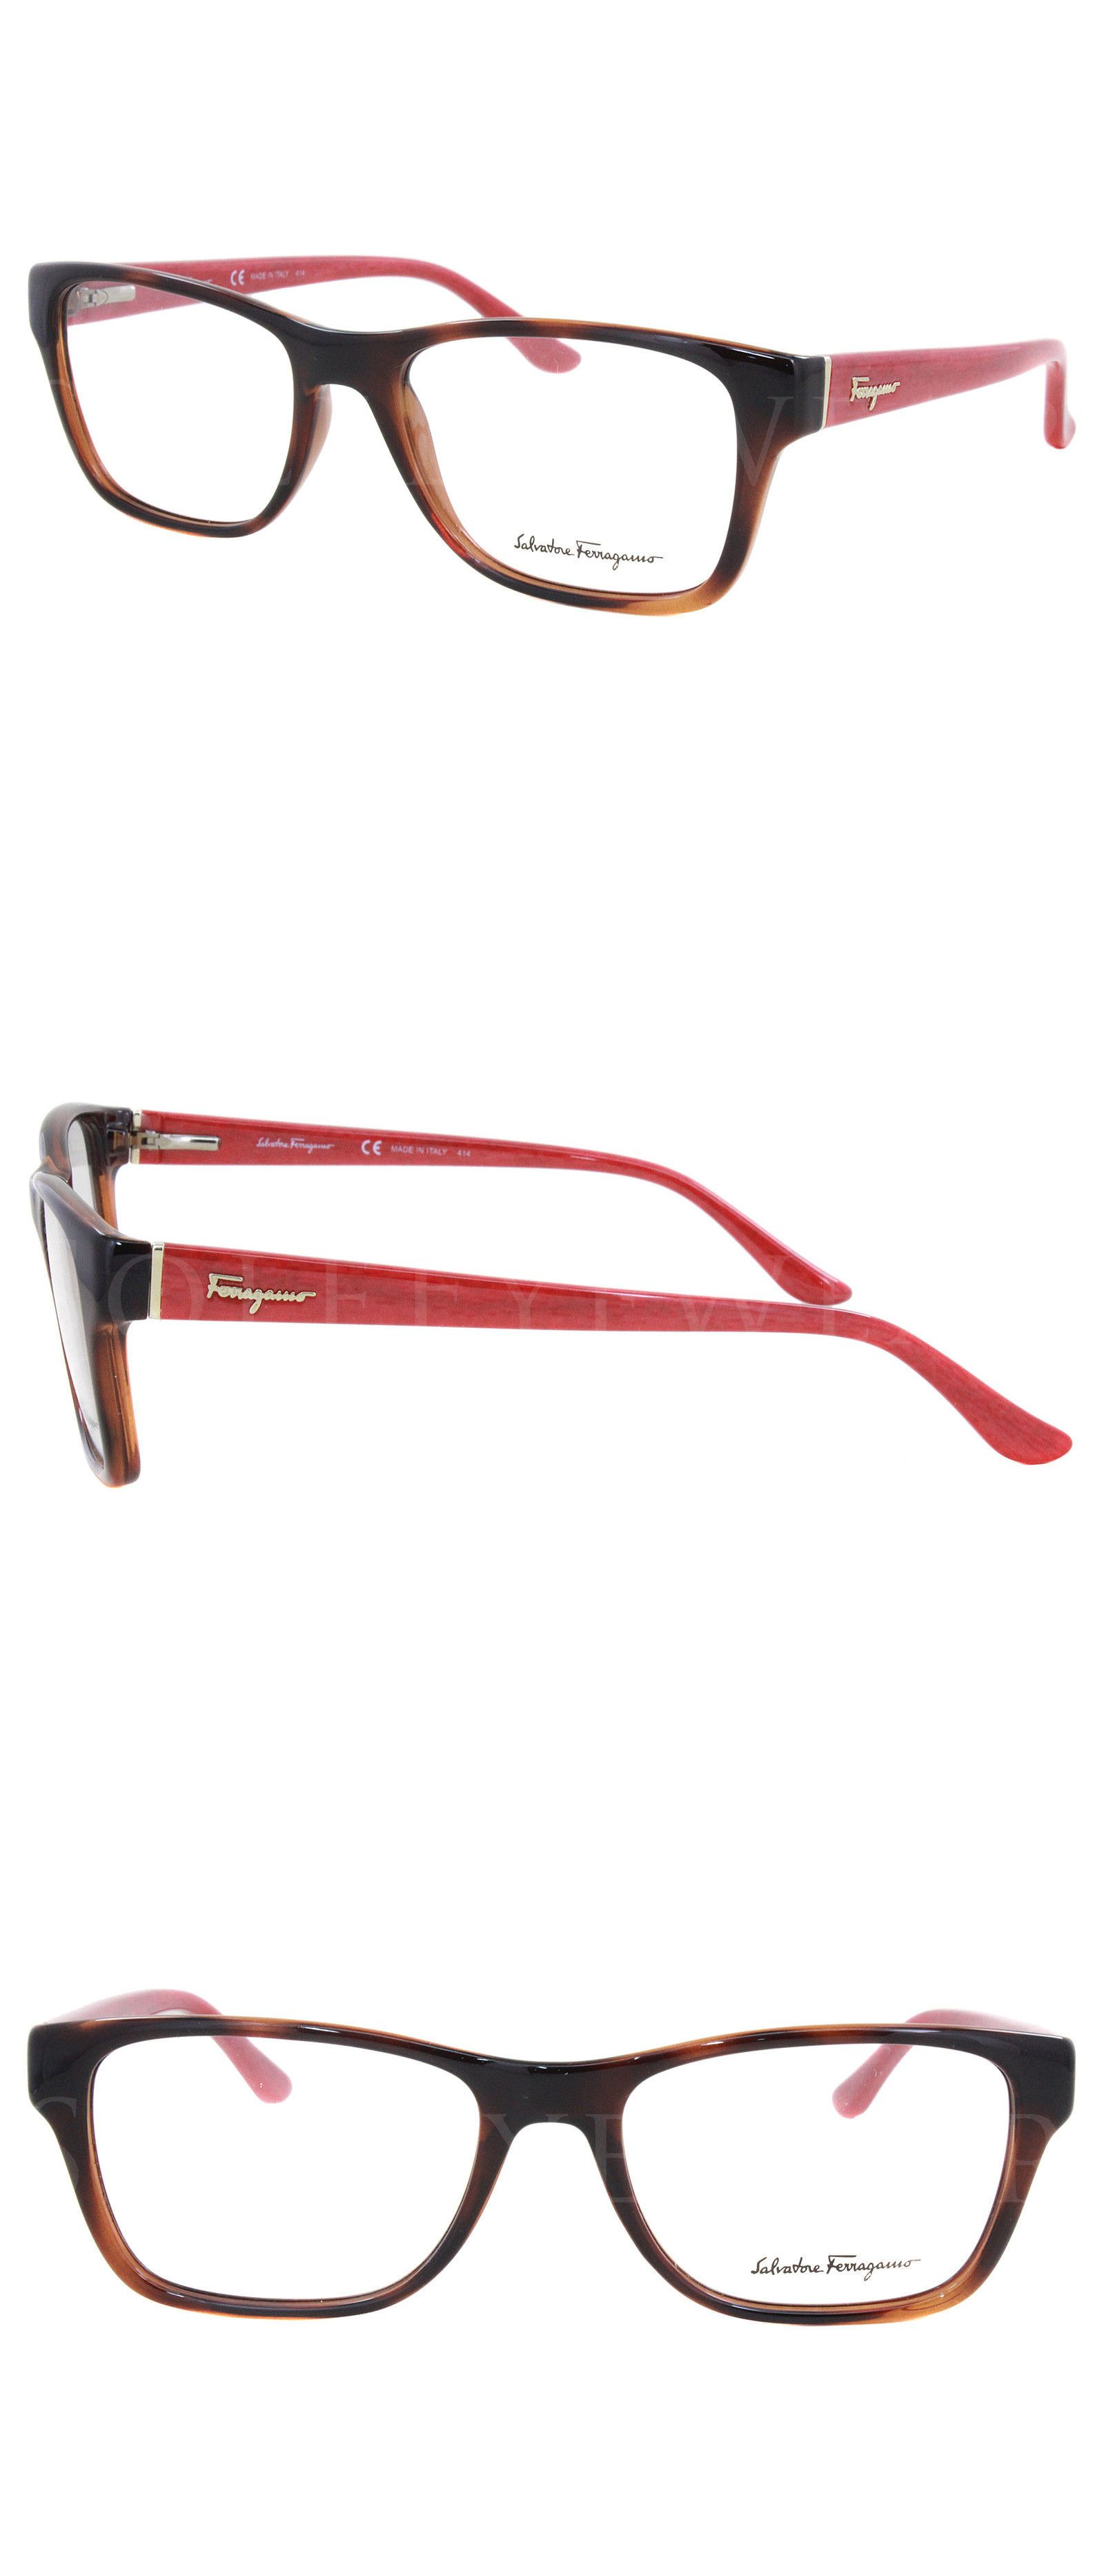 eyeglass frames new salvatore ferragamo sf2687 207 52mm havana red optical eyeglasses frames - Ebay Eyeglasses Frames